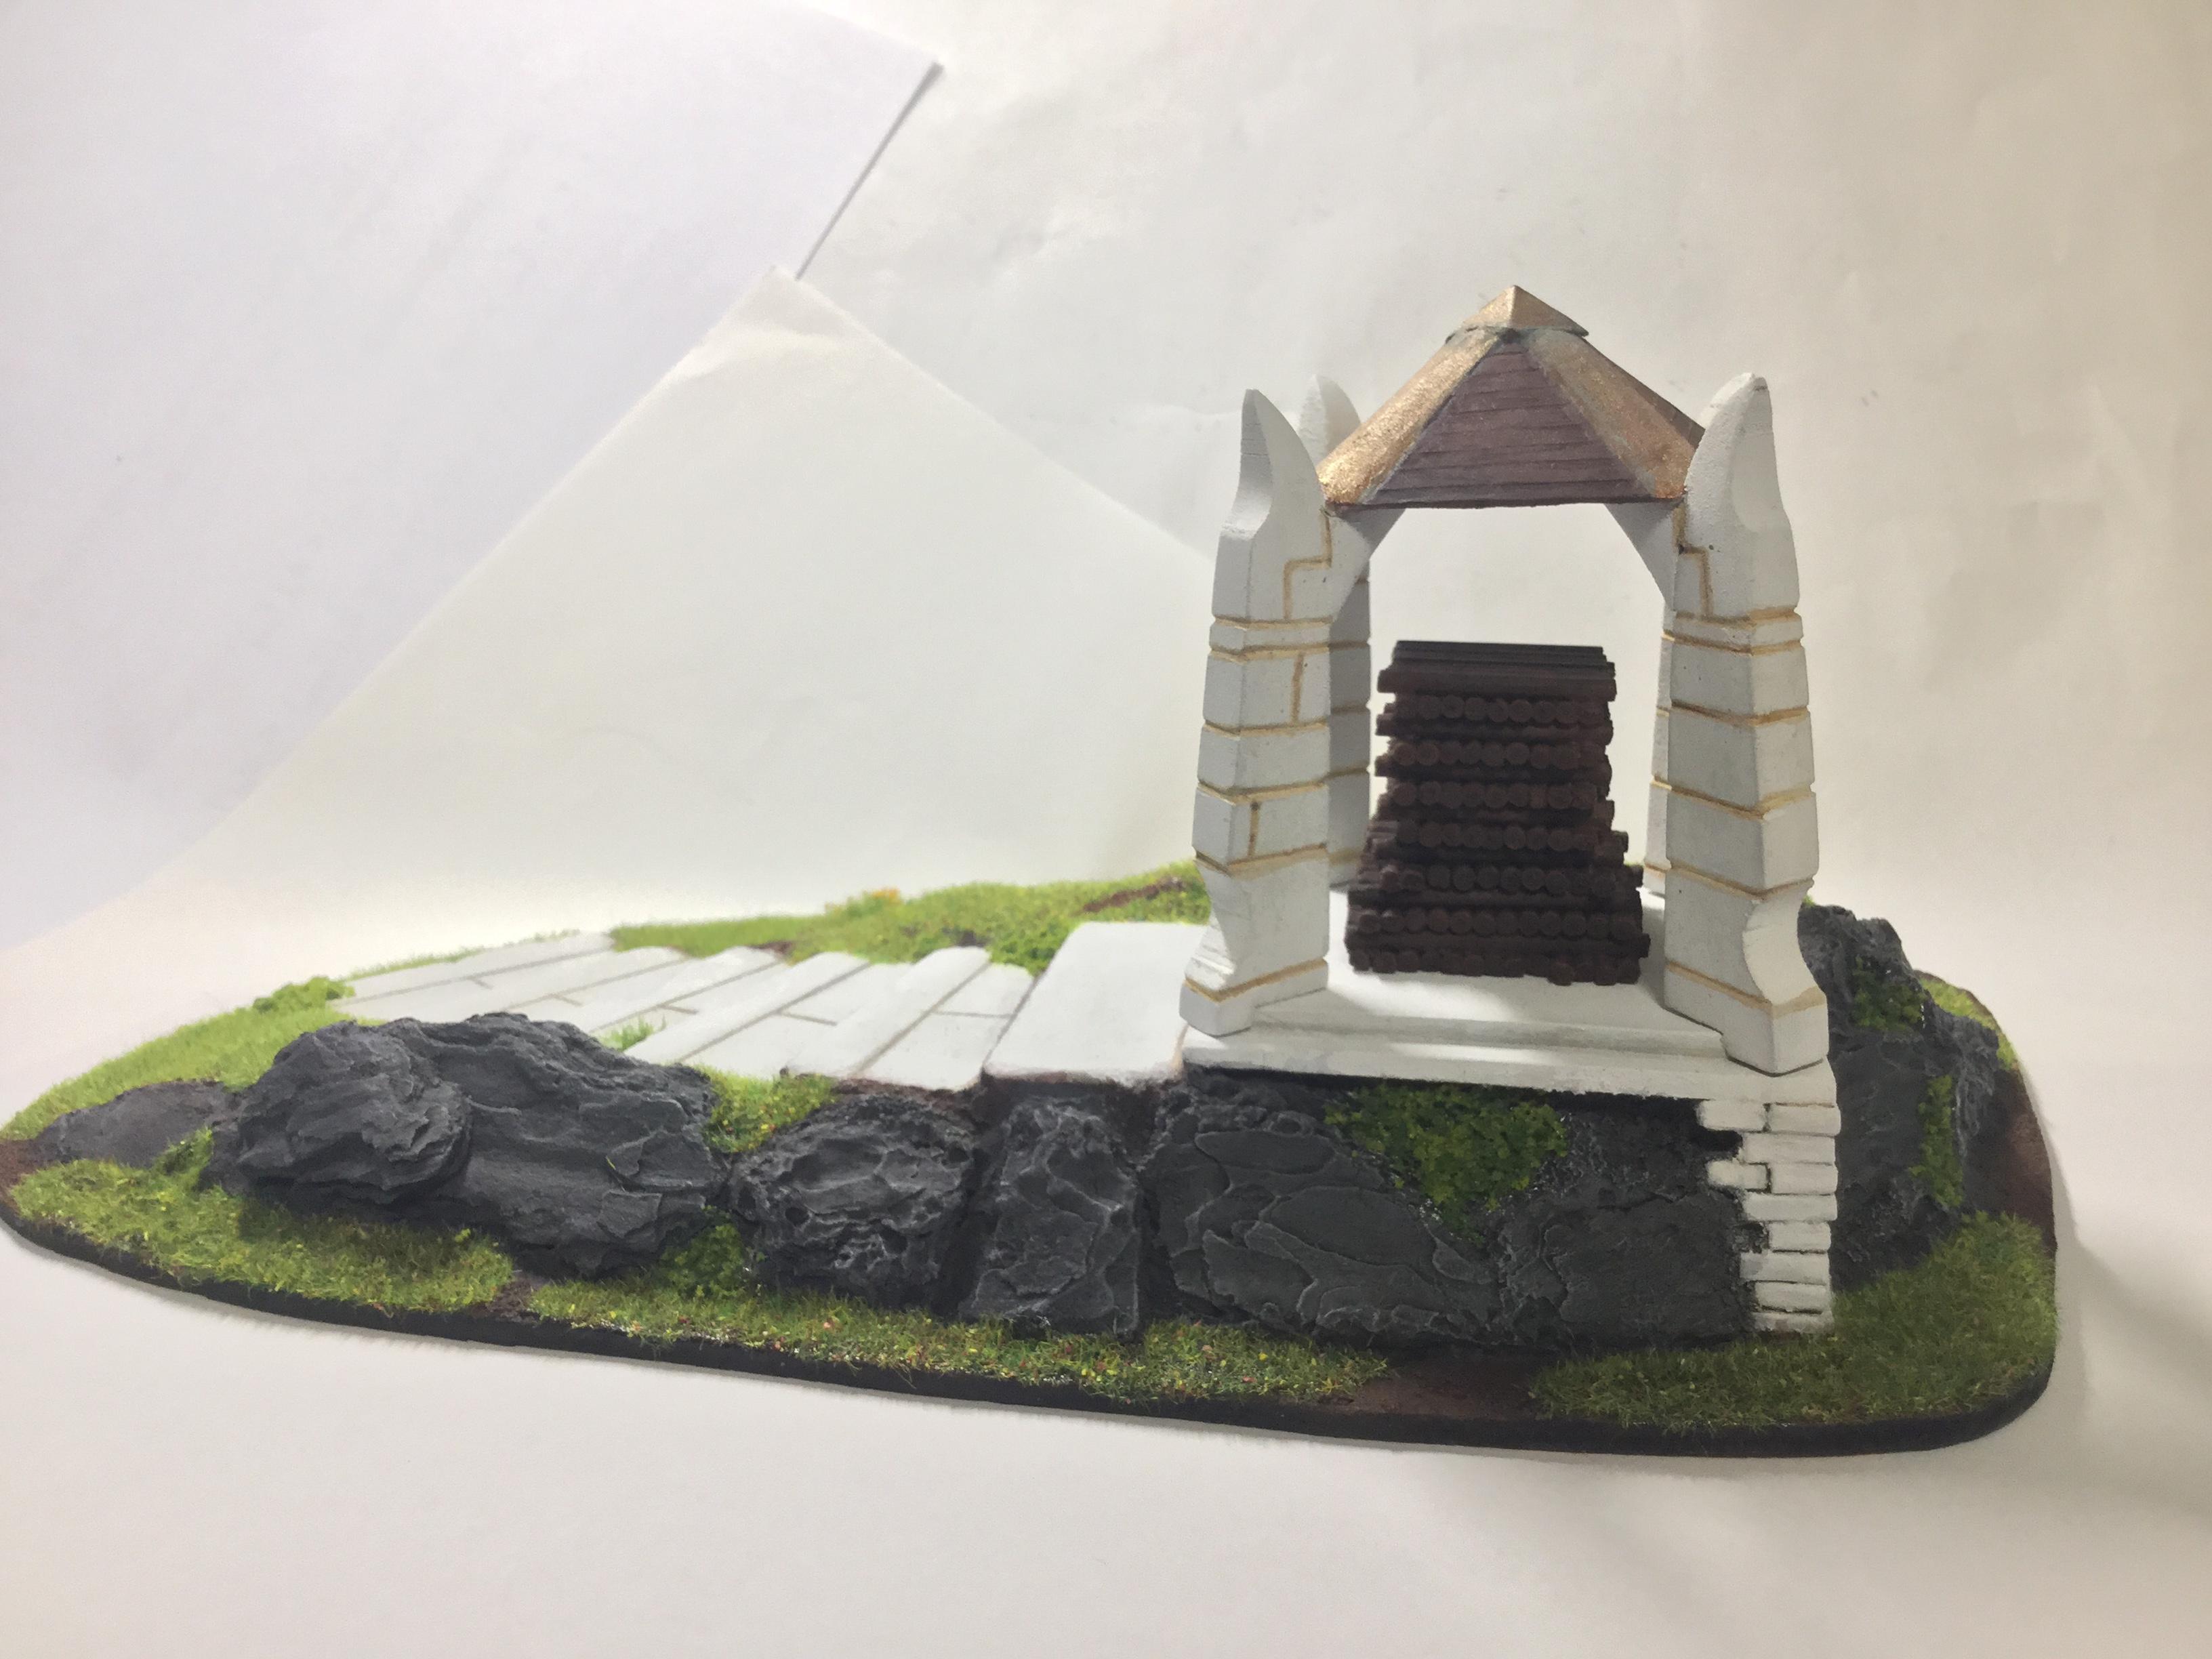 Colline et feu d'alarme du Gondor 1571001636-feu-d-alarme-du-gondor-aout-2019-26